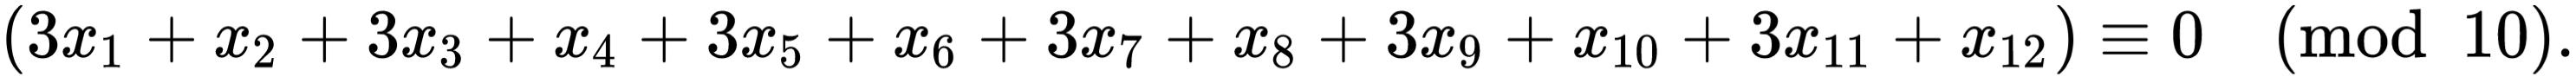 Check digit calculation